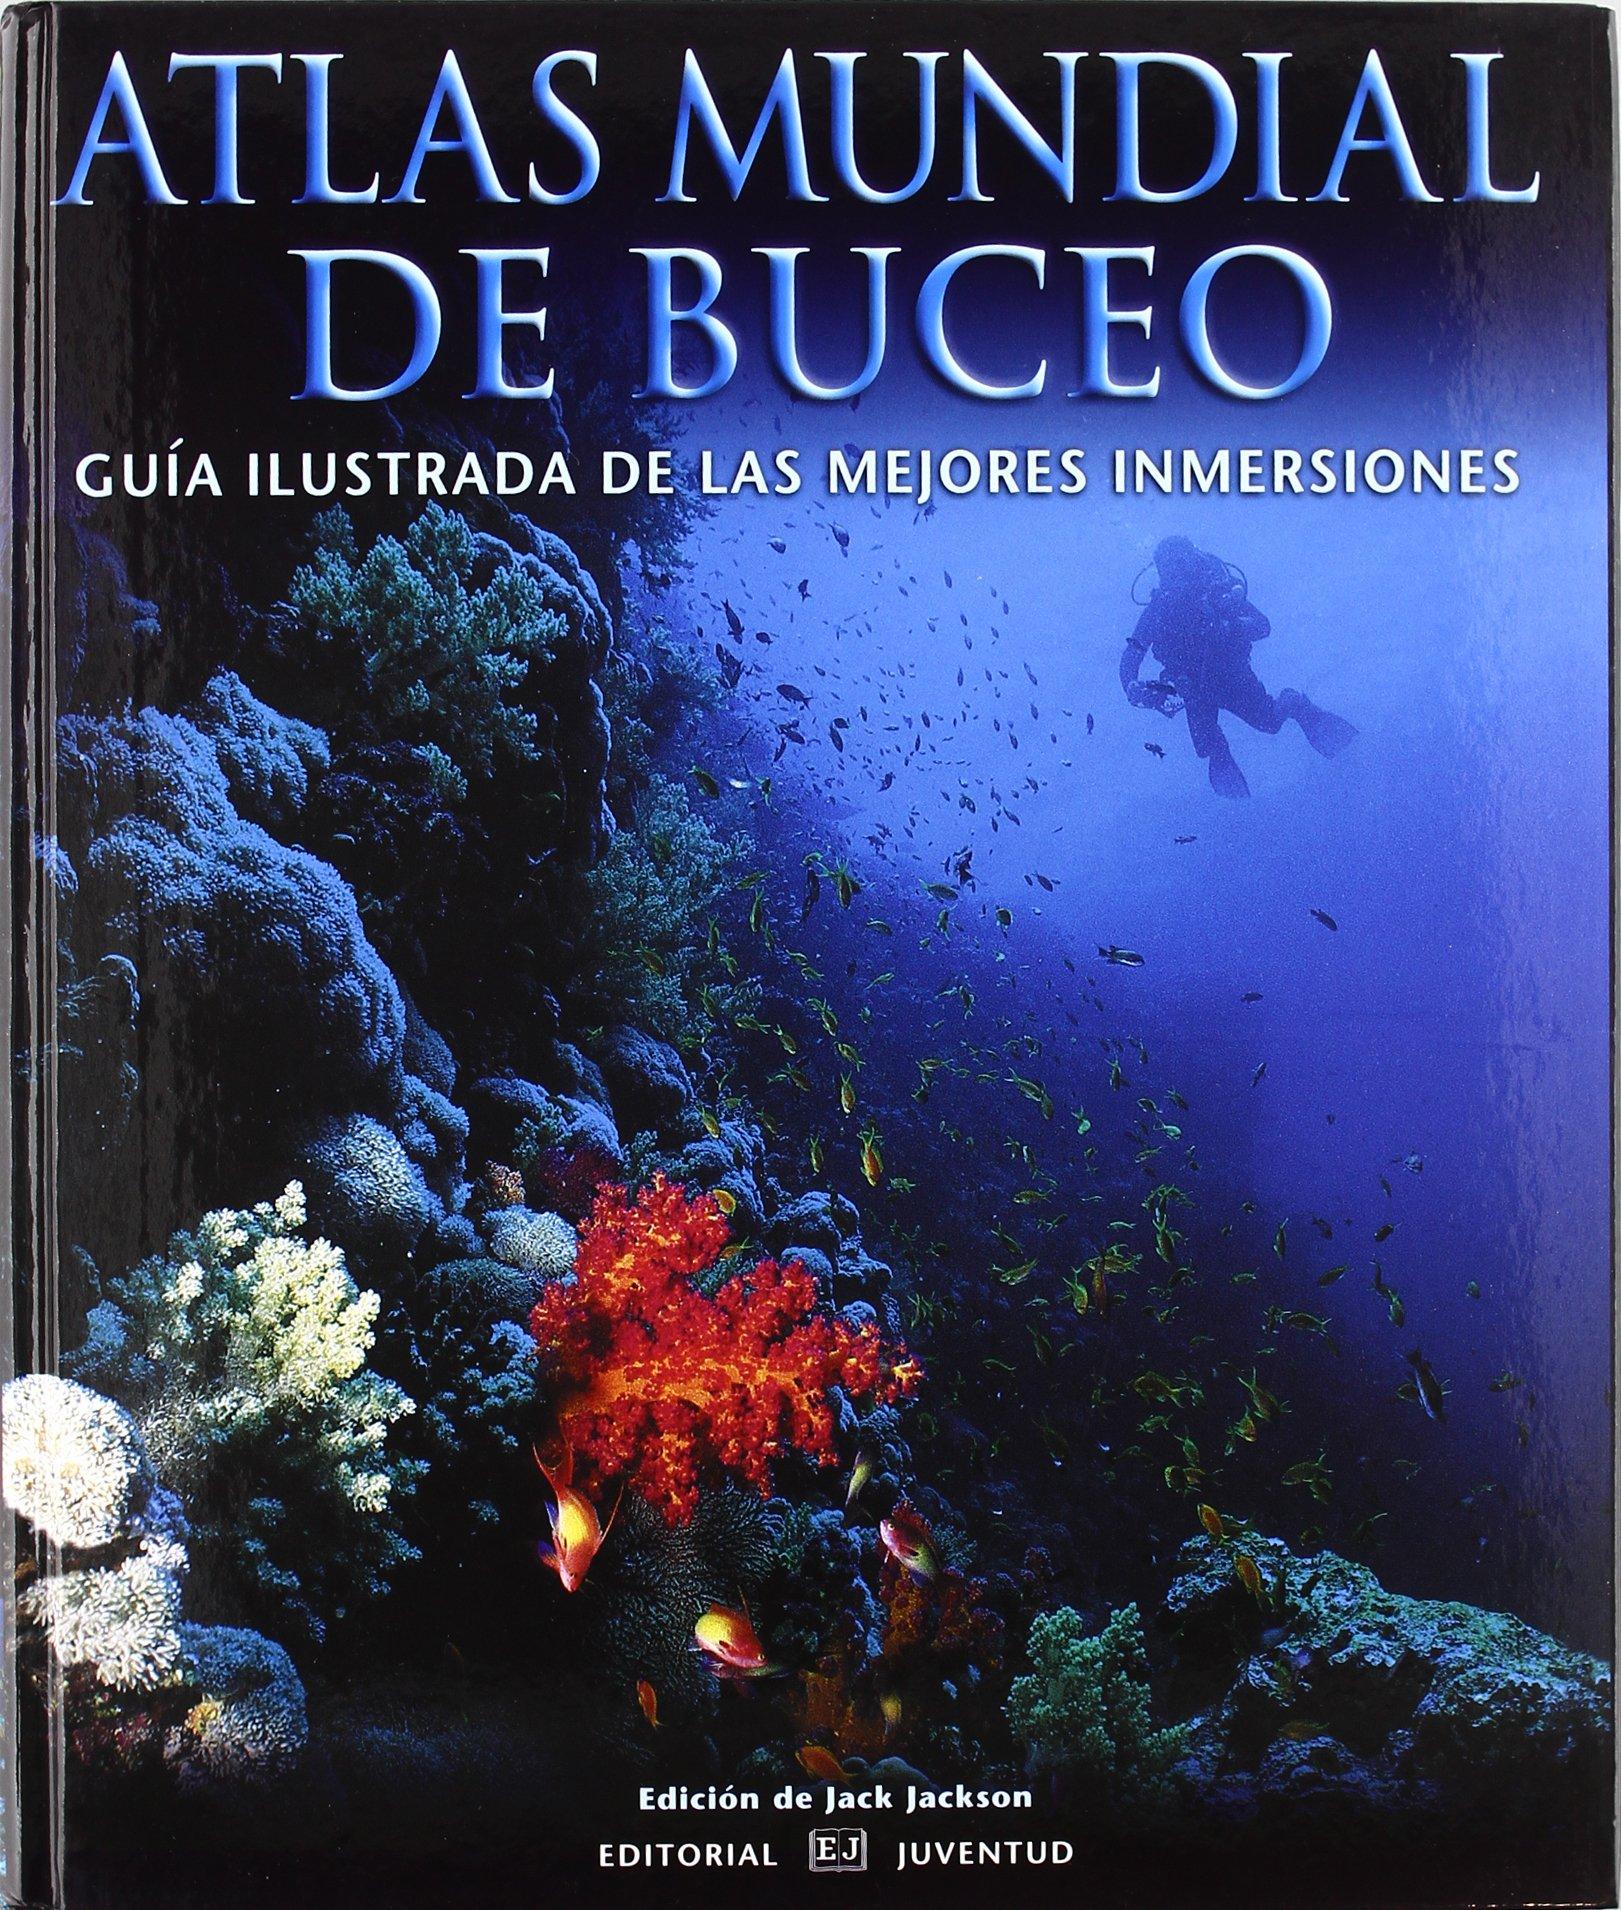 Atlas mundial de buceo (Spanish) Hardcover – 2007